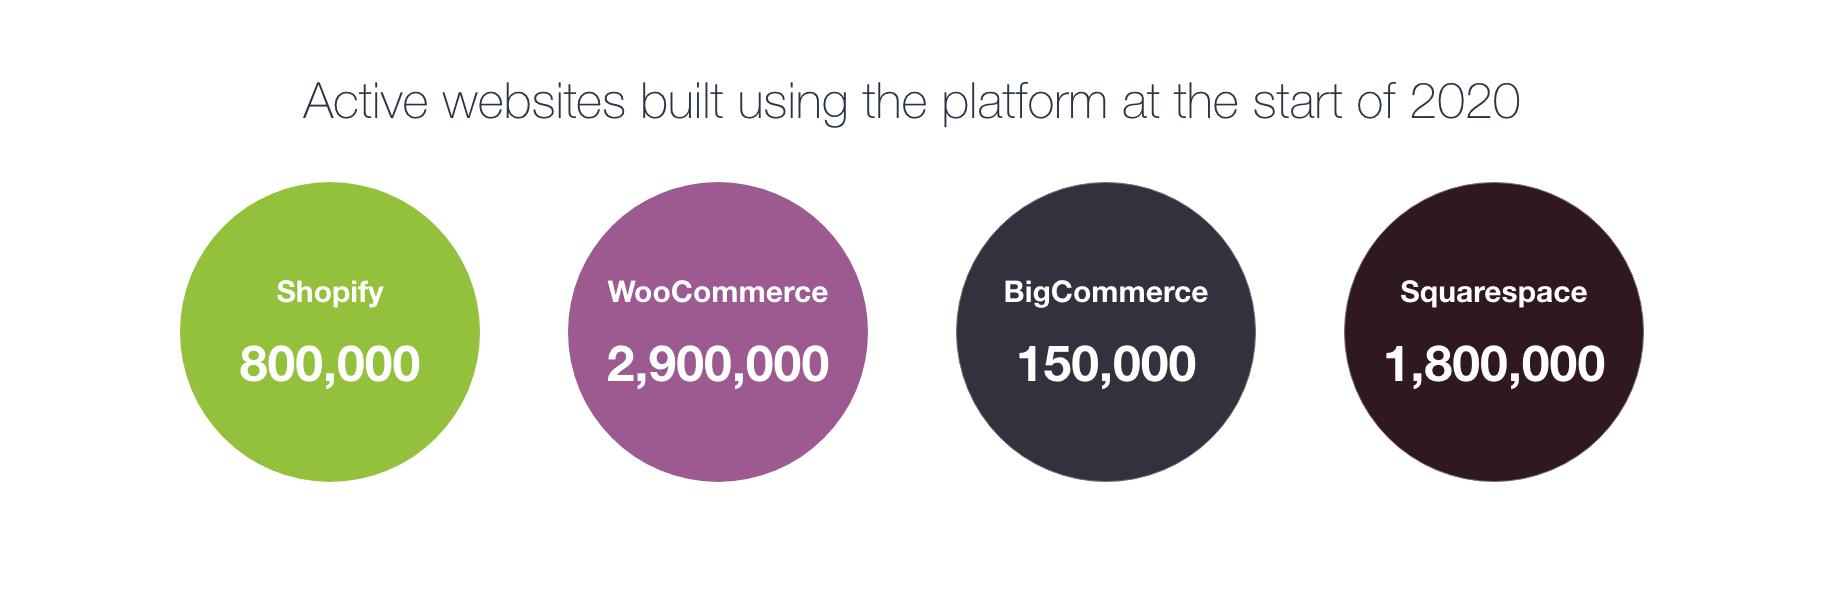 ecommerce platform figures